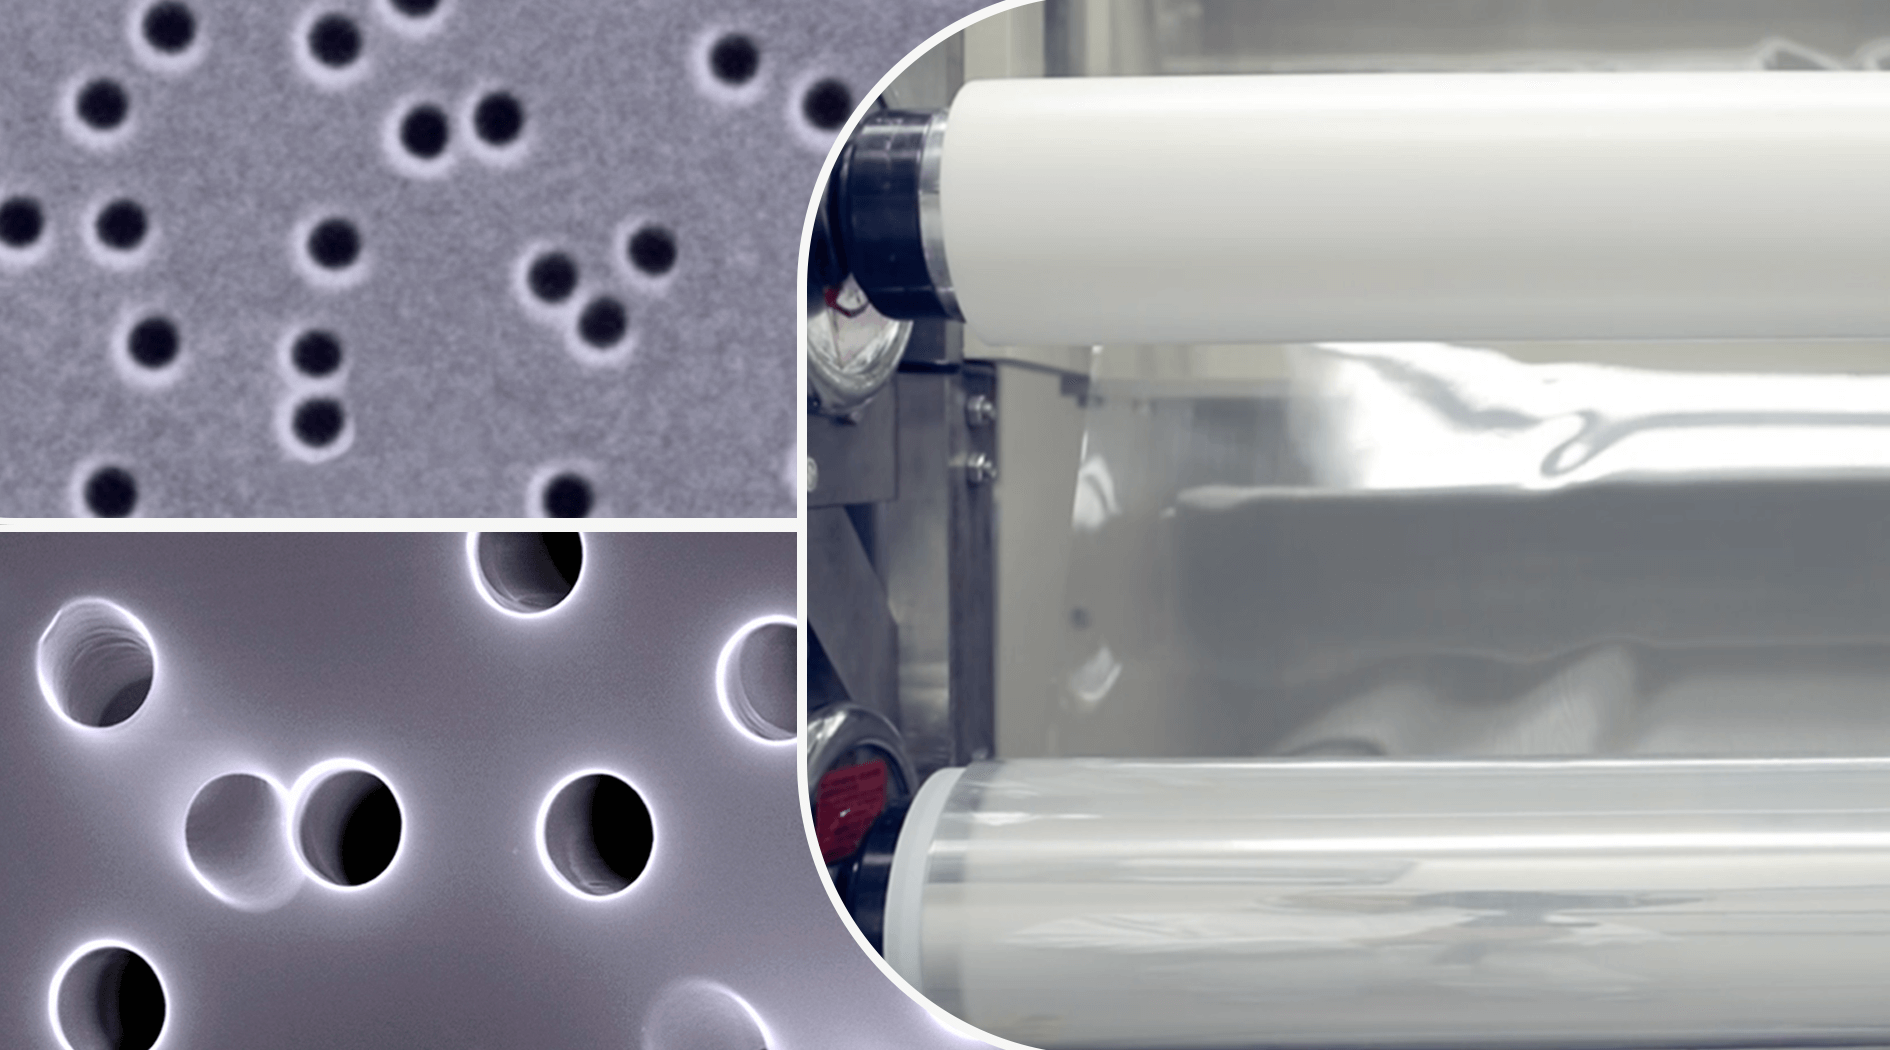 developer, manufacturer and supplier of track-etched membrane